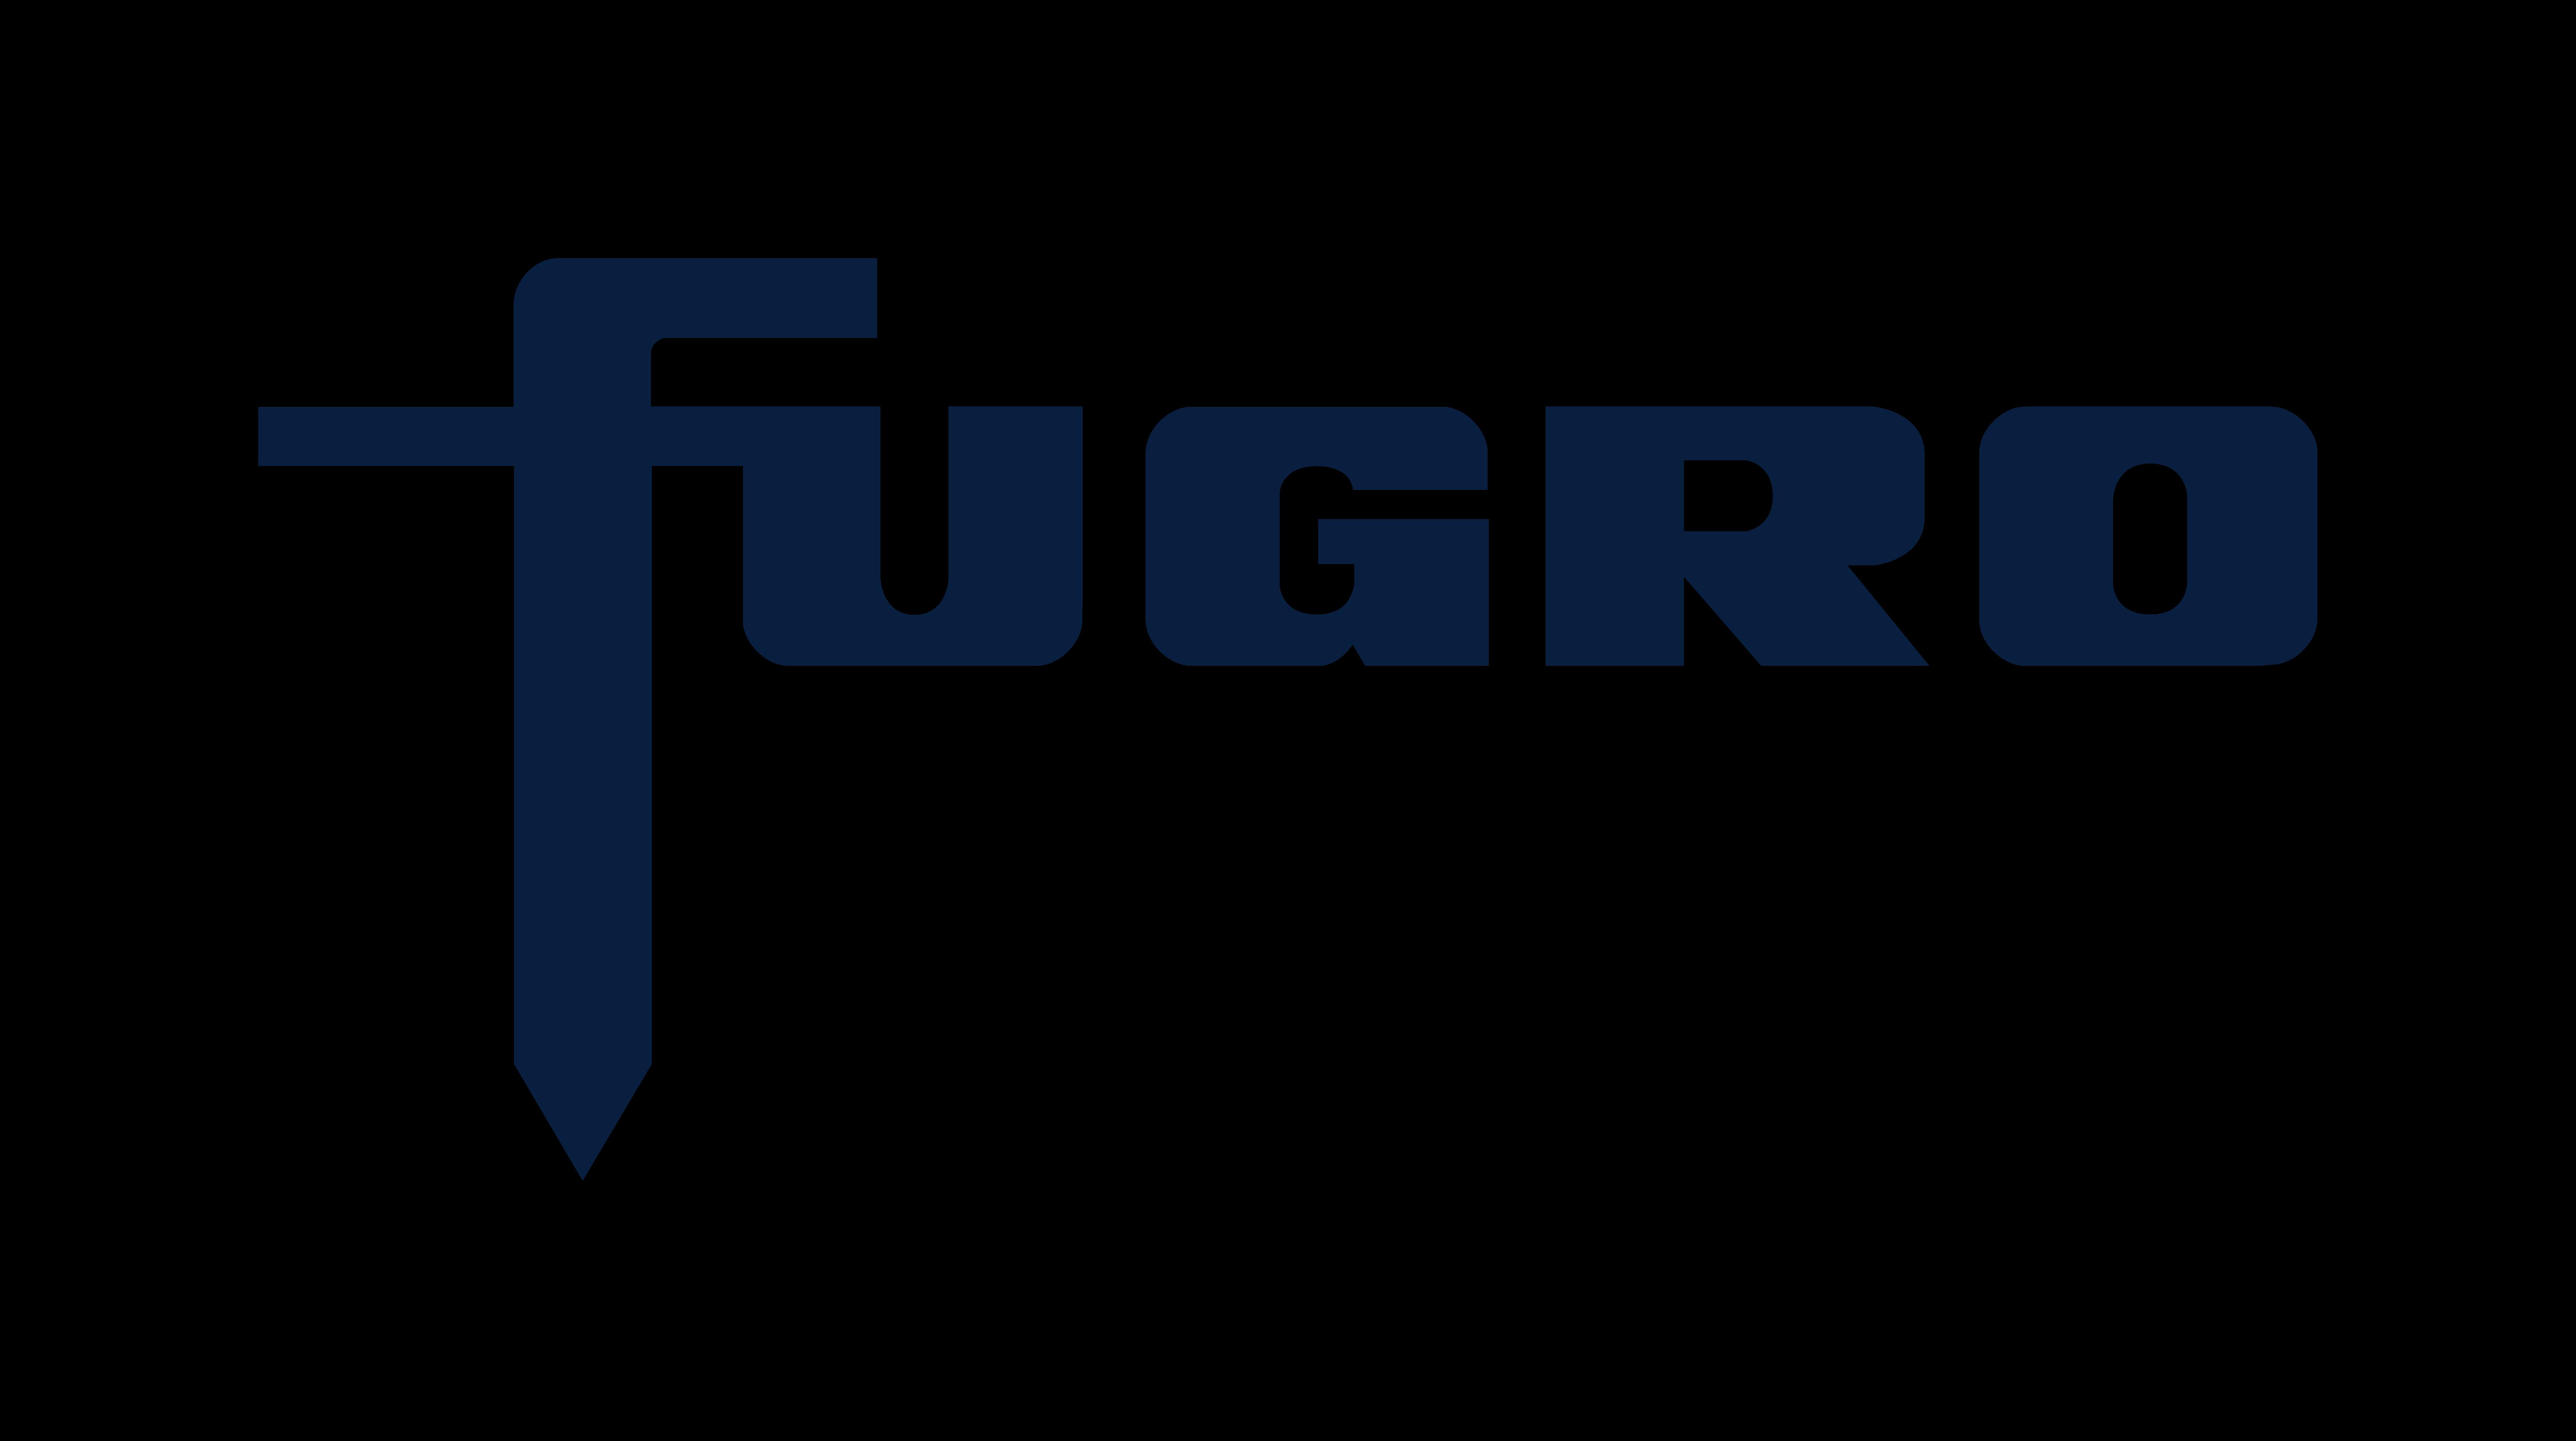 Fugro のロゴ